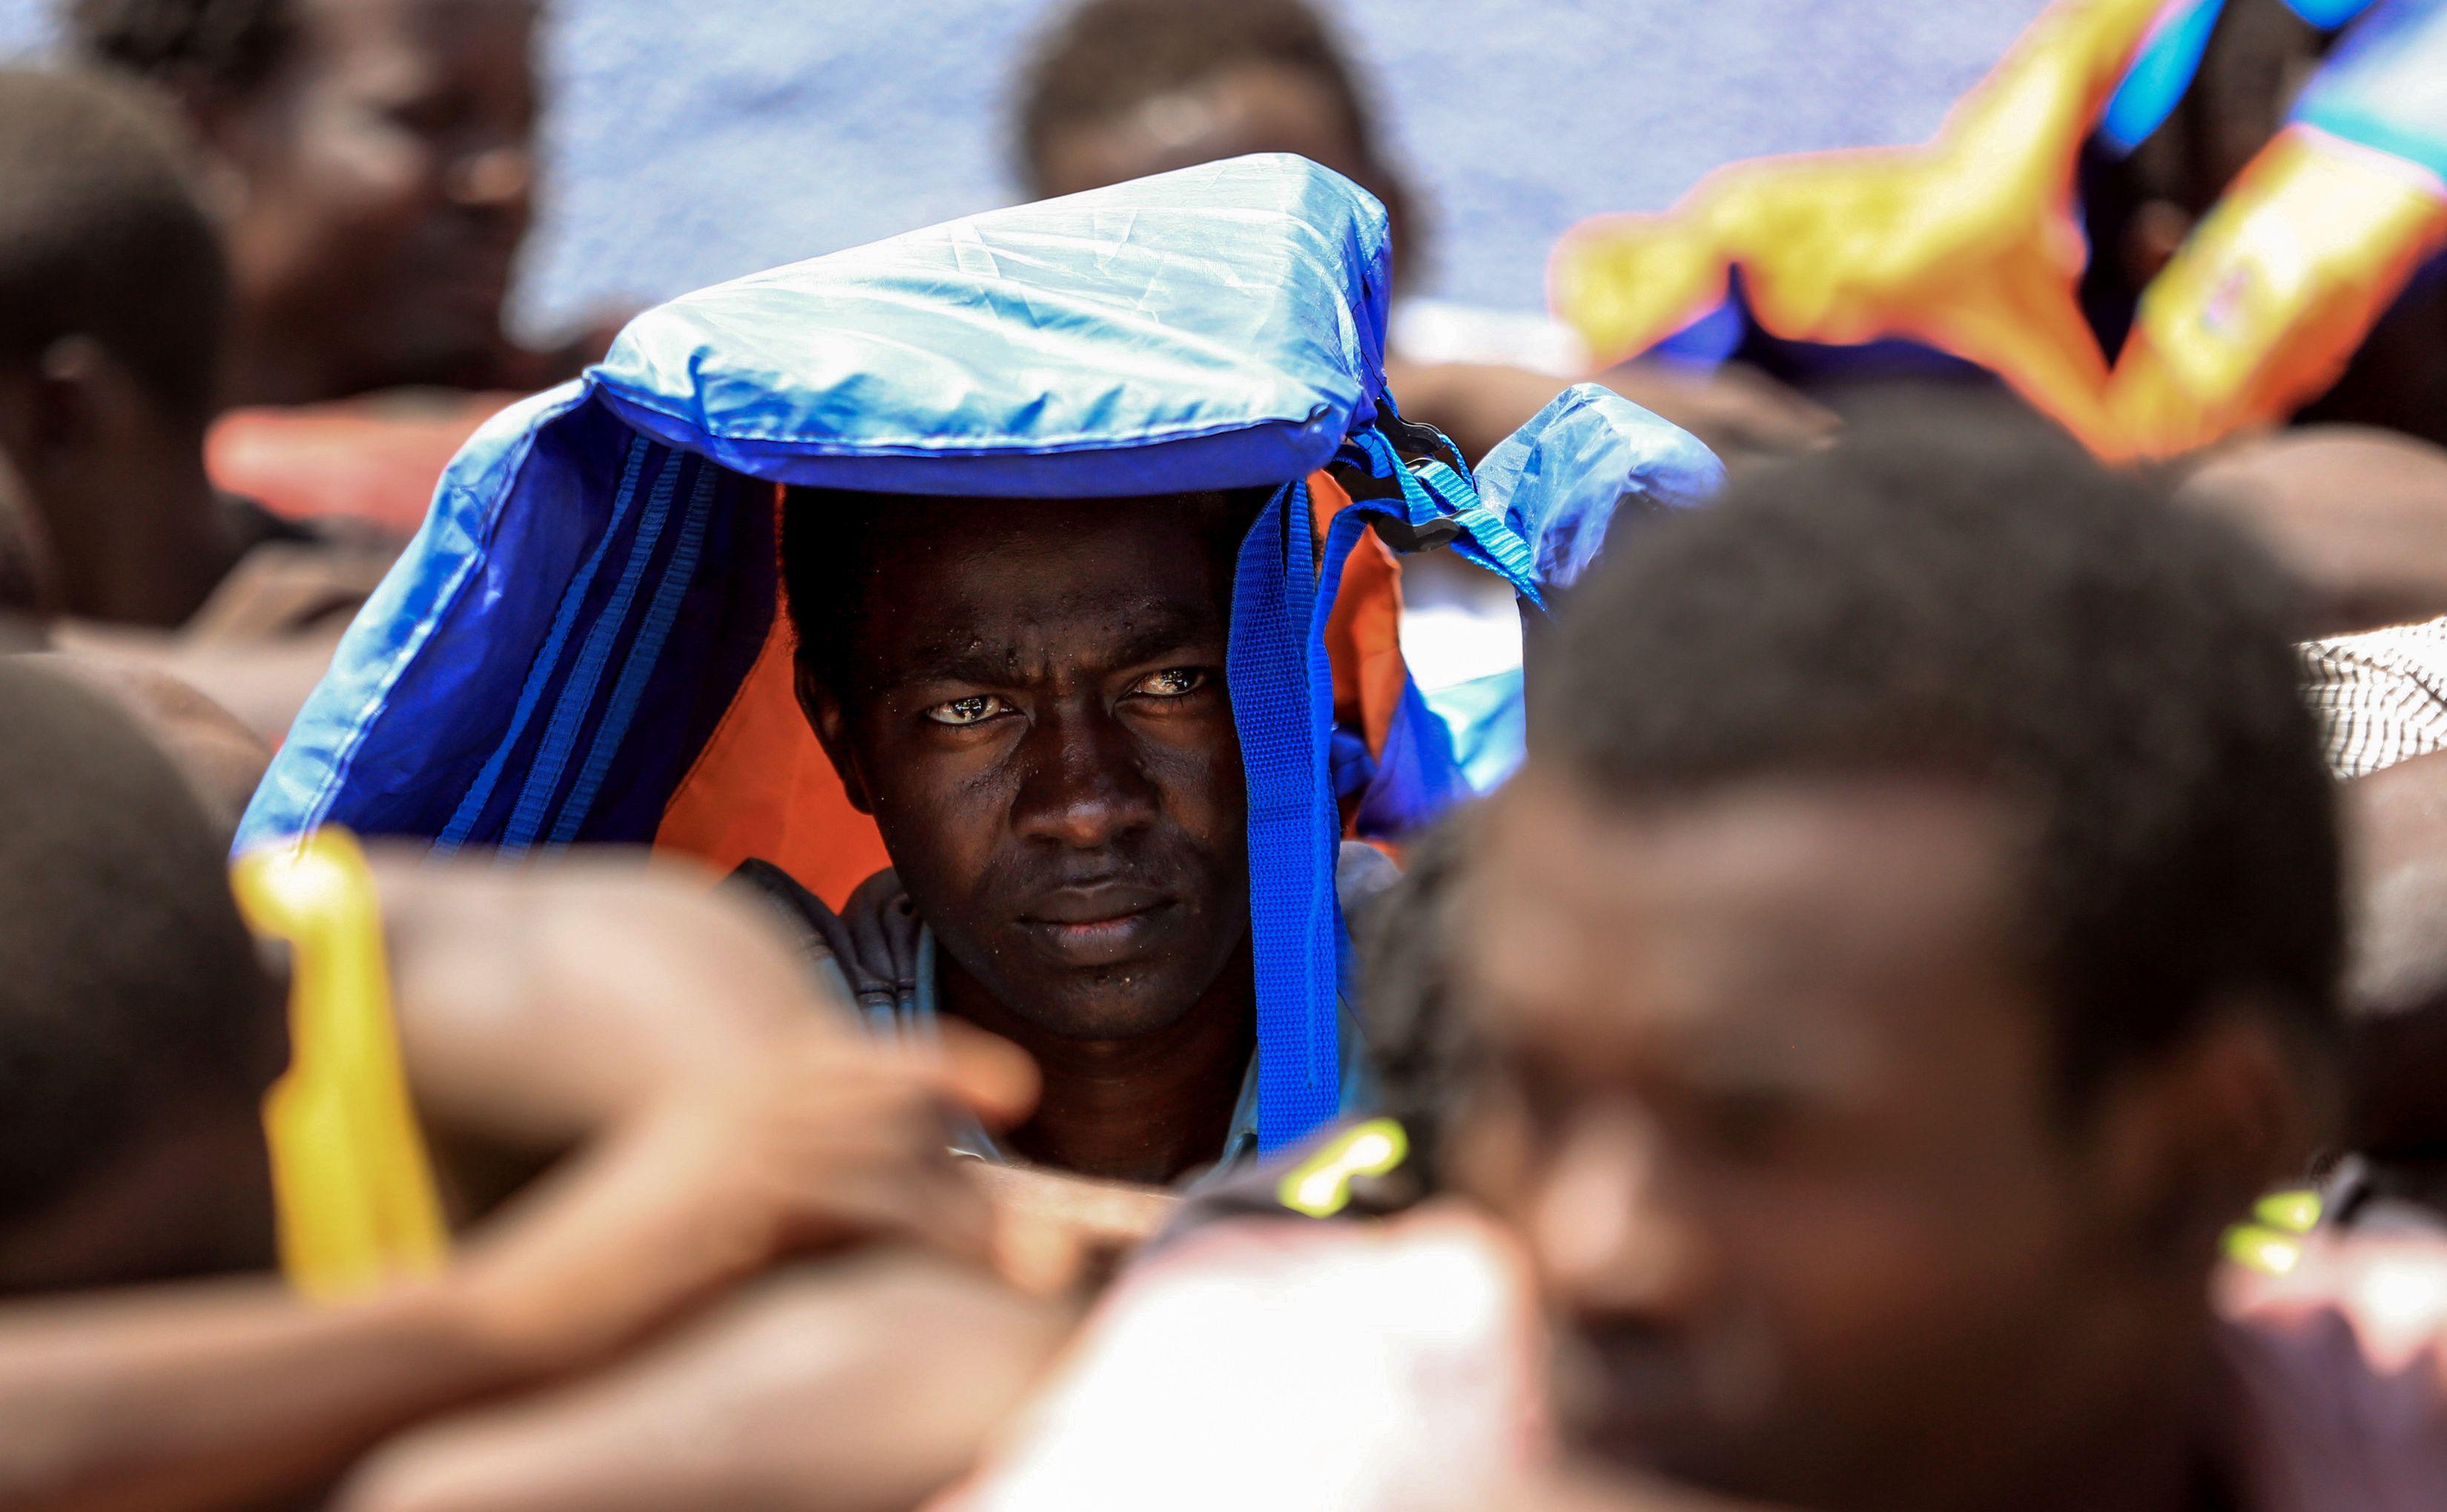 180 migrantes podem ter sido deliberadamente afogados